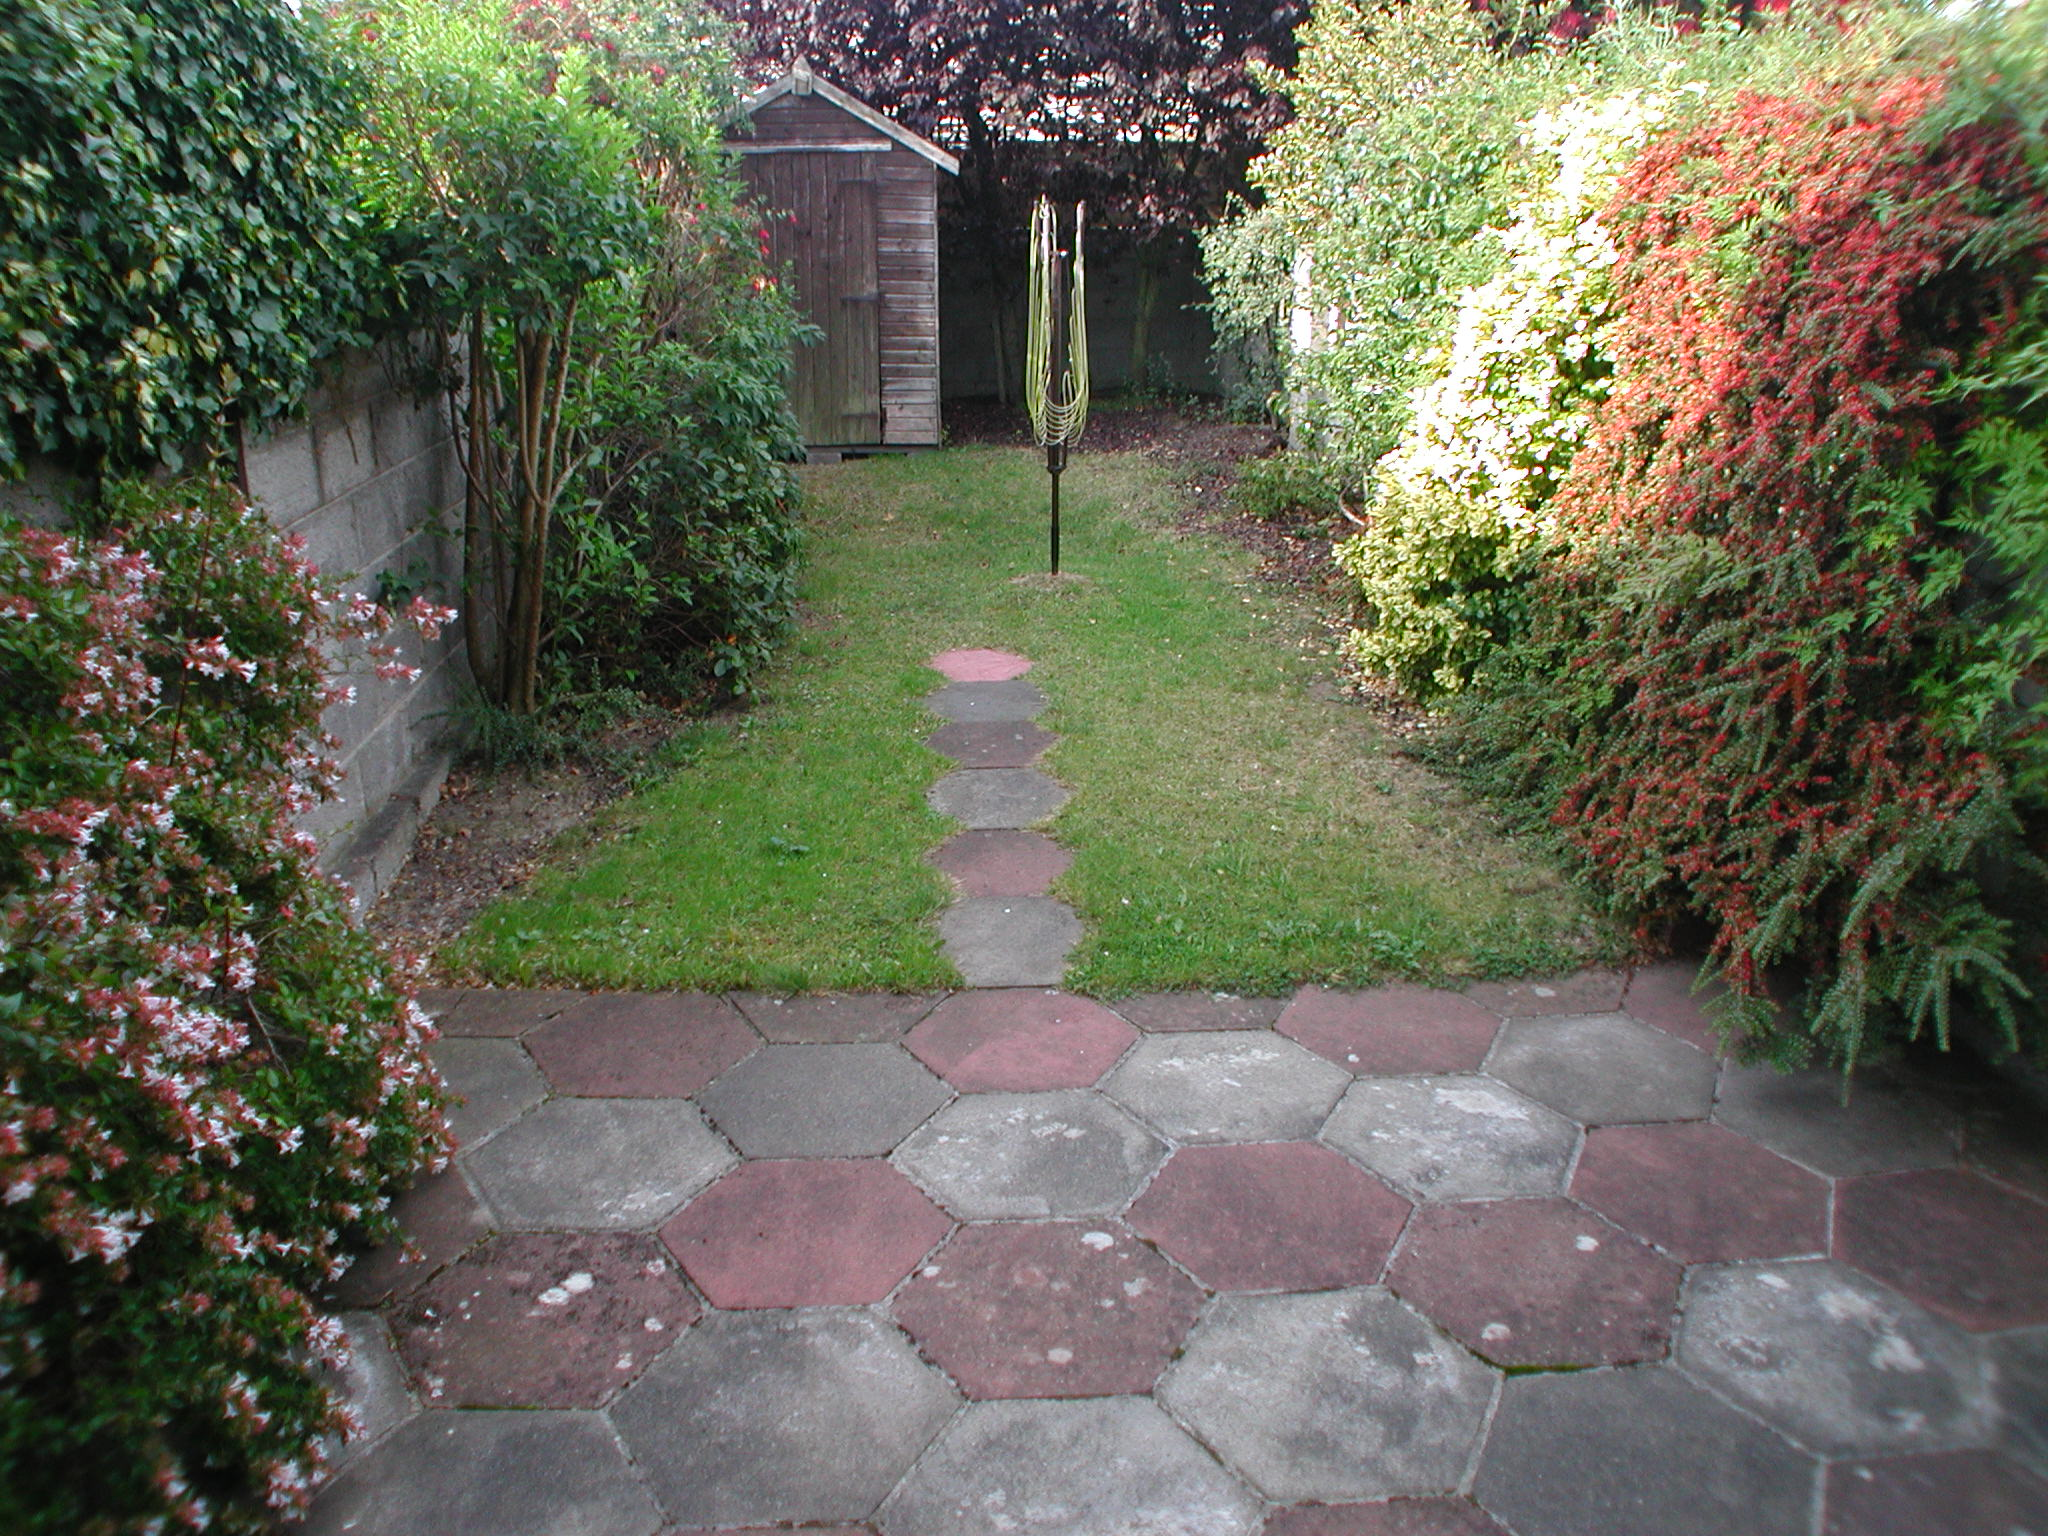 Landscape gardening services walkinstown dublin ireland for Award winning patio designs